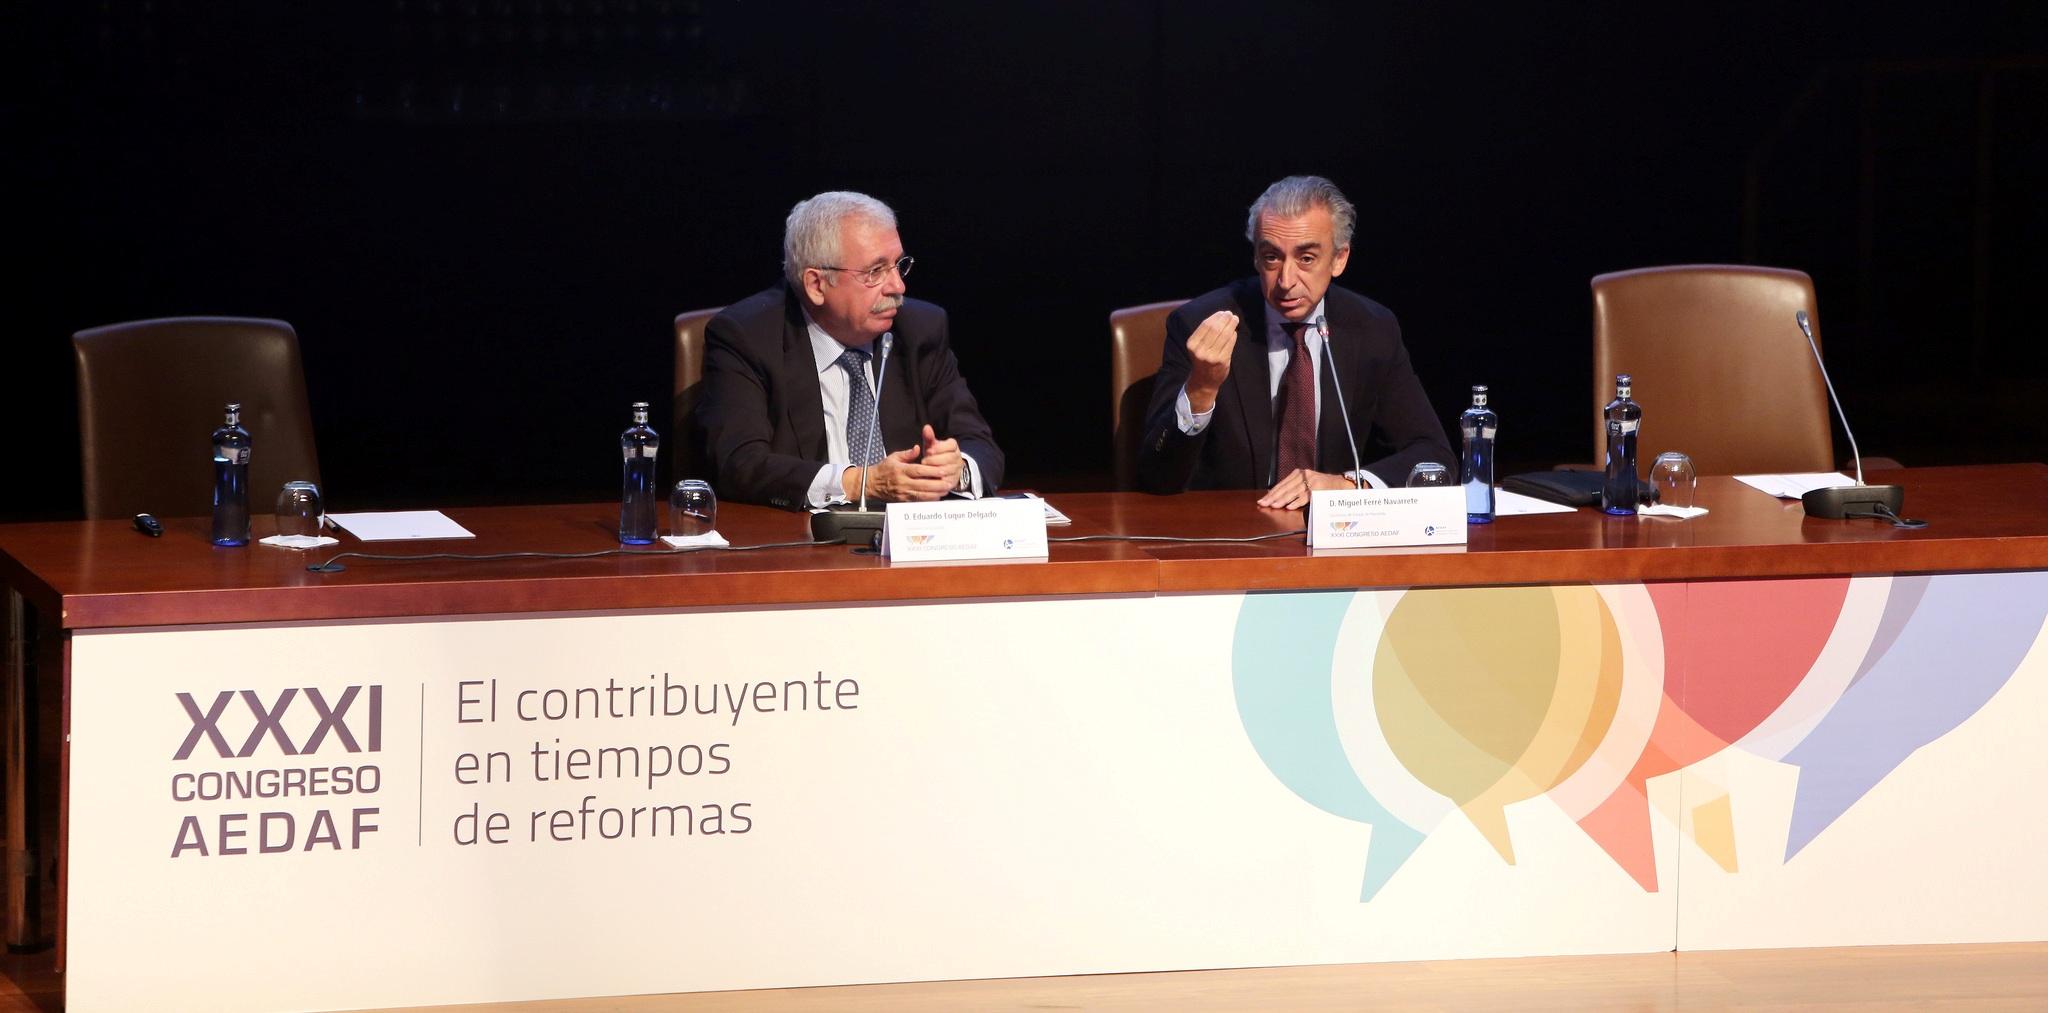 La AEDAF celebró su XXXI Congreso Nacional